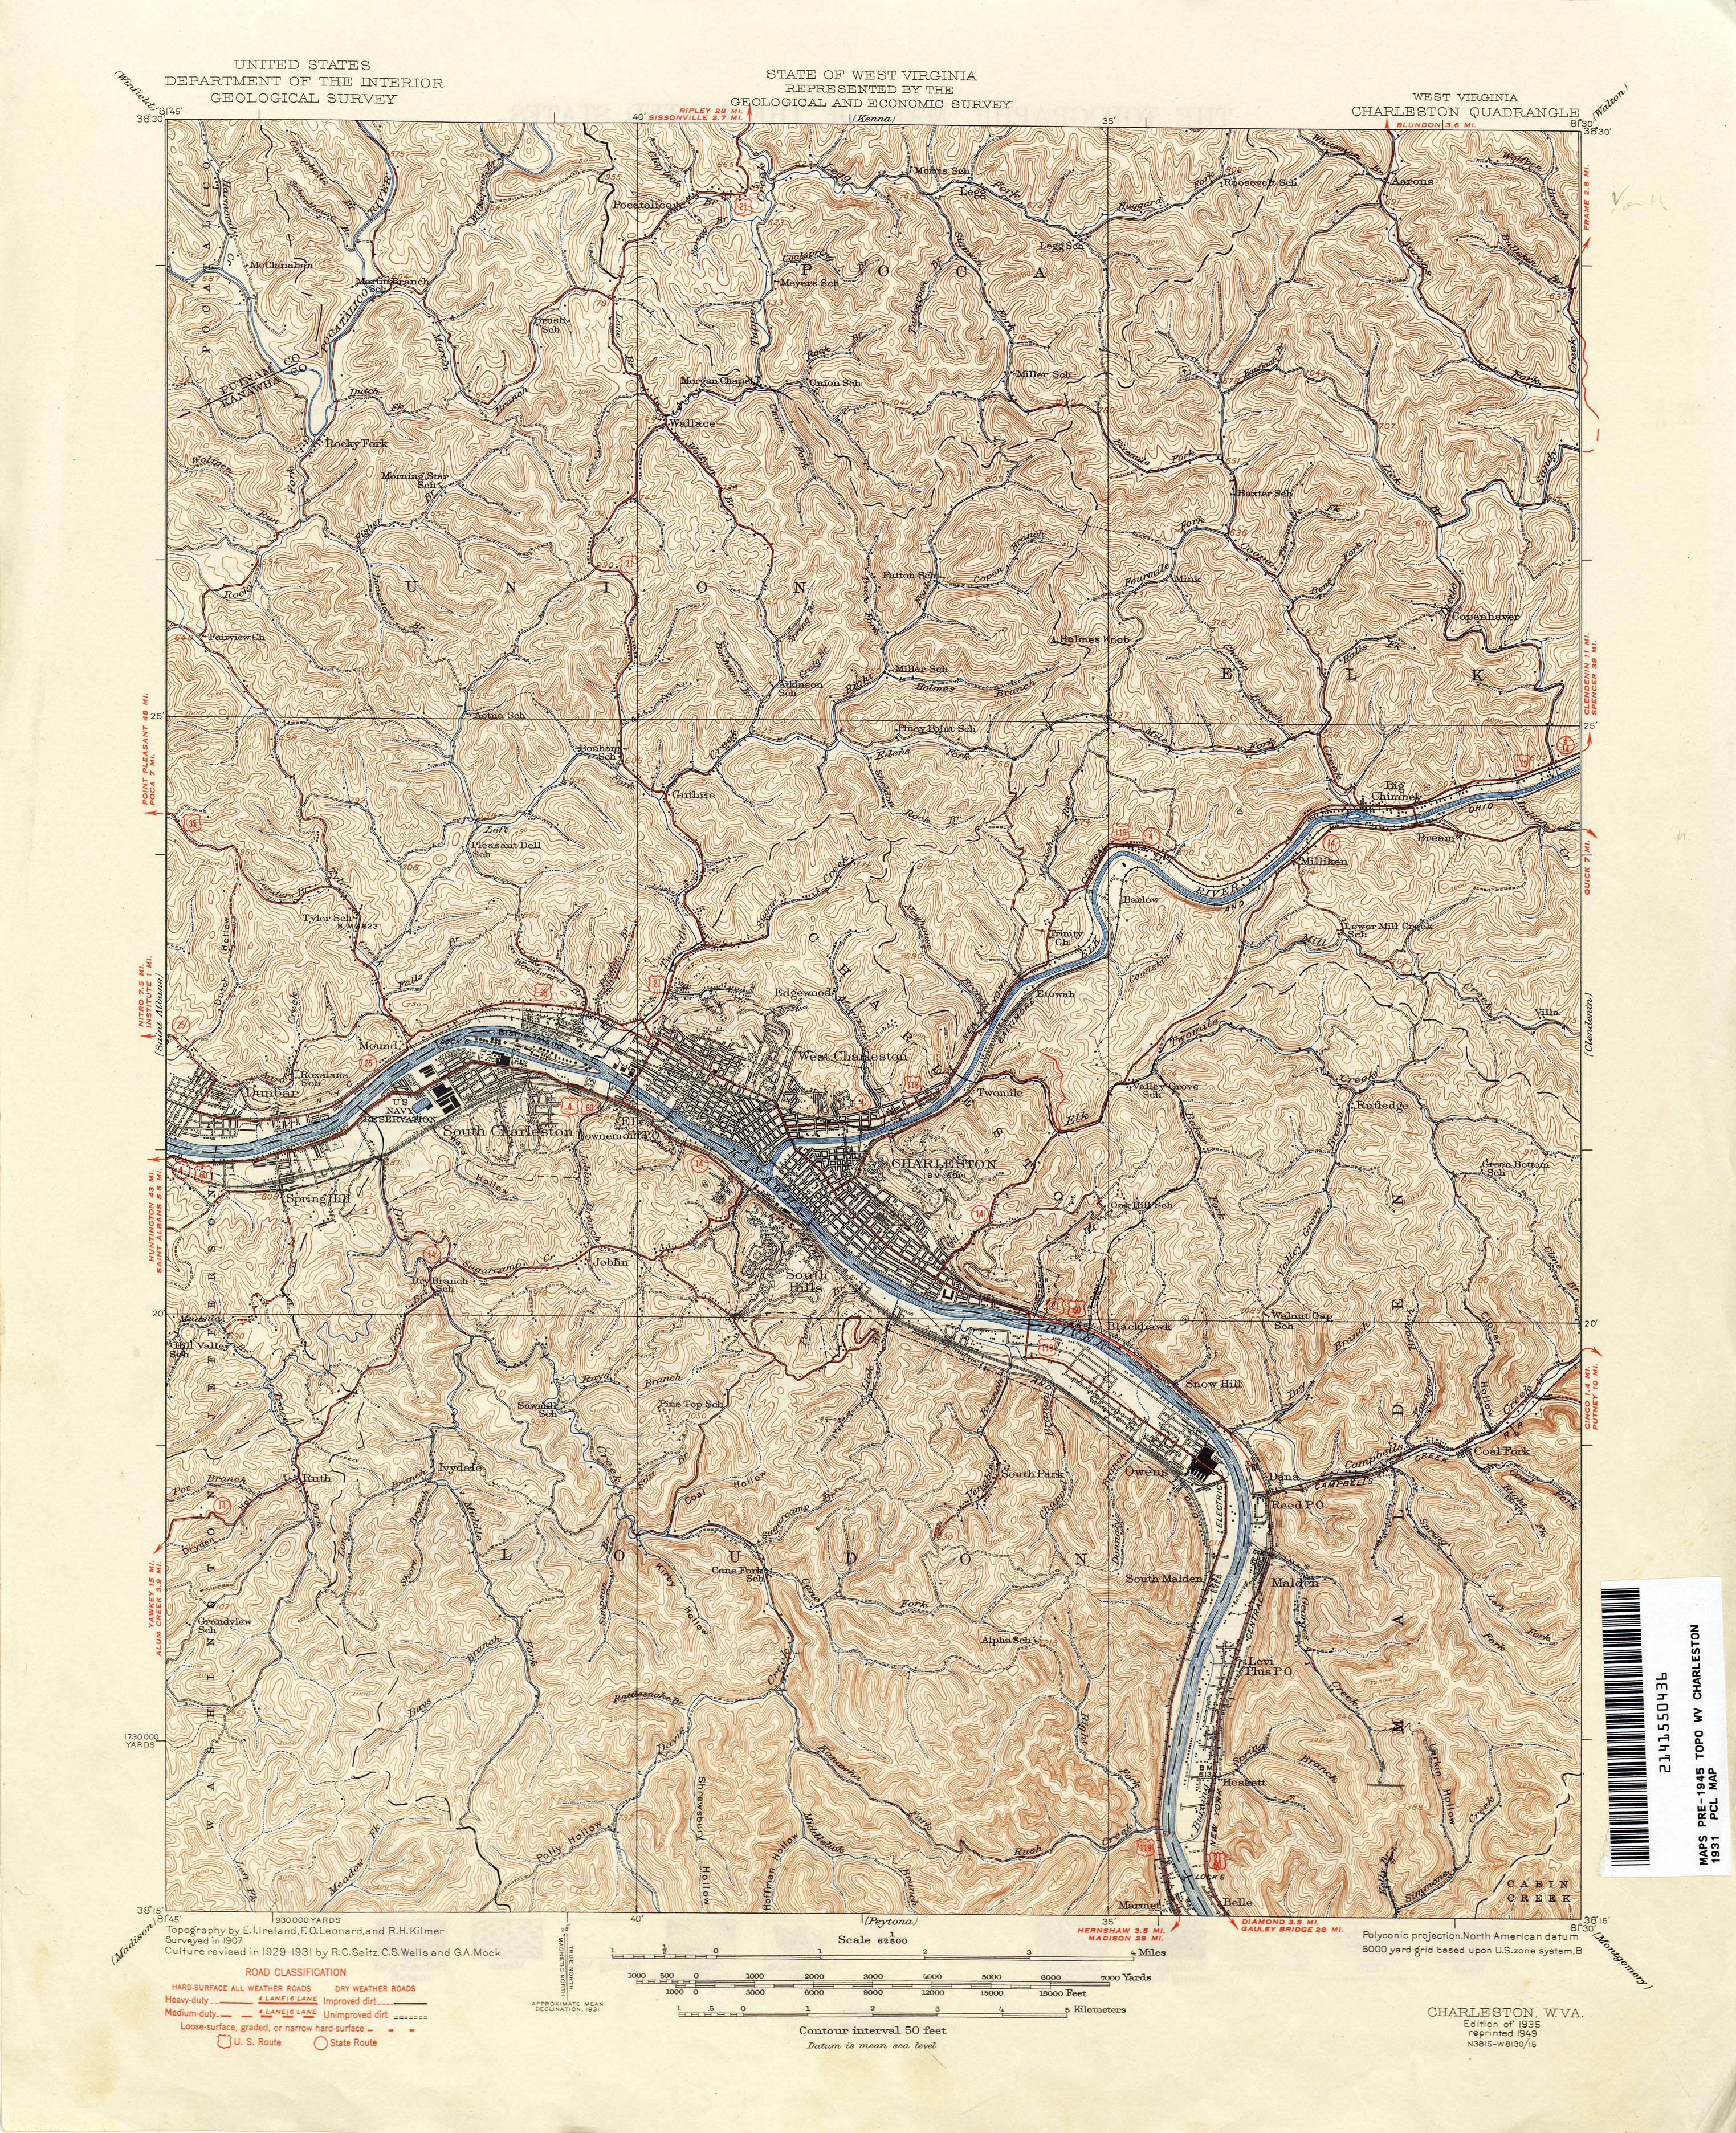 West Virginia Historical Topographic Maps - Perry-Castañeda